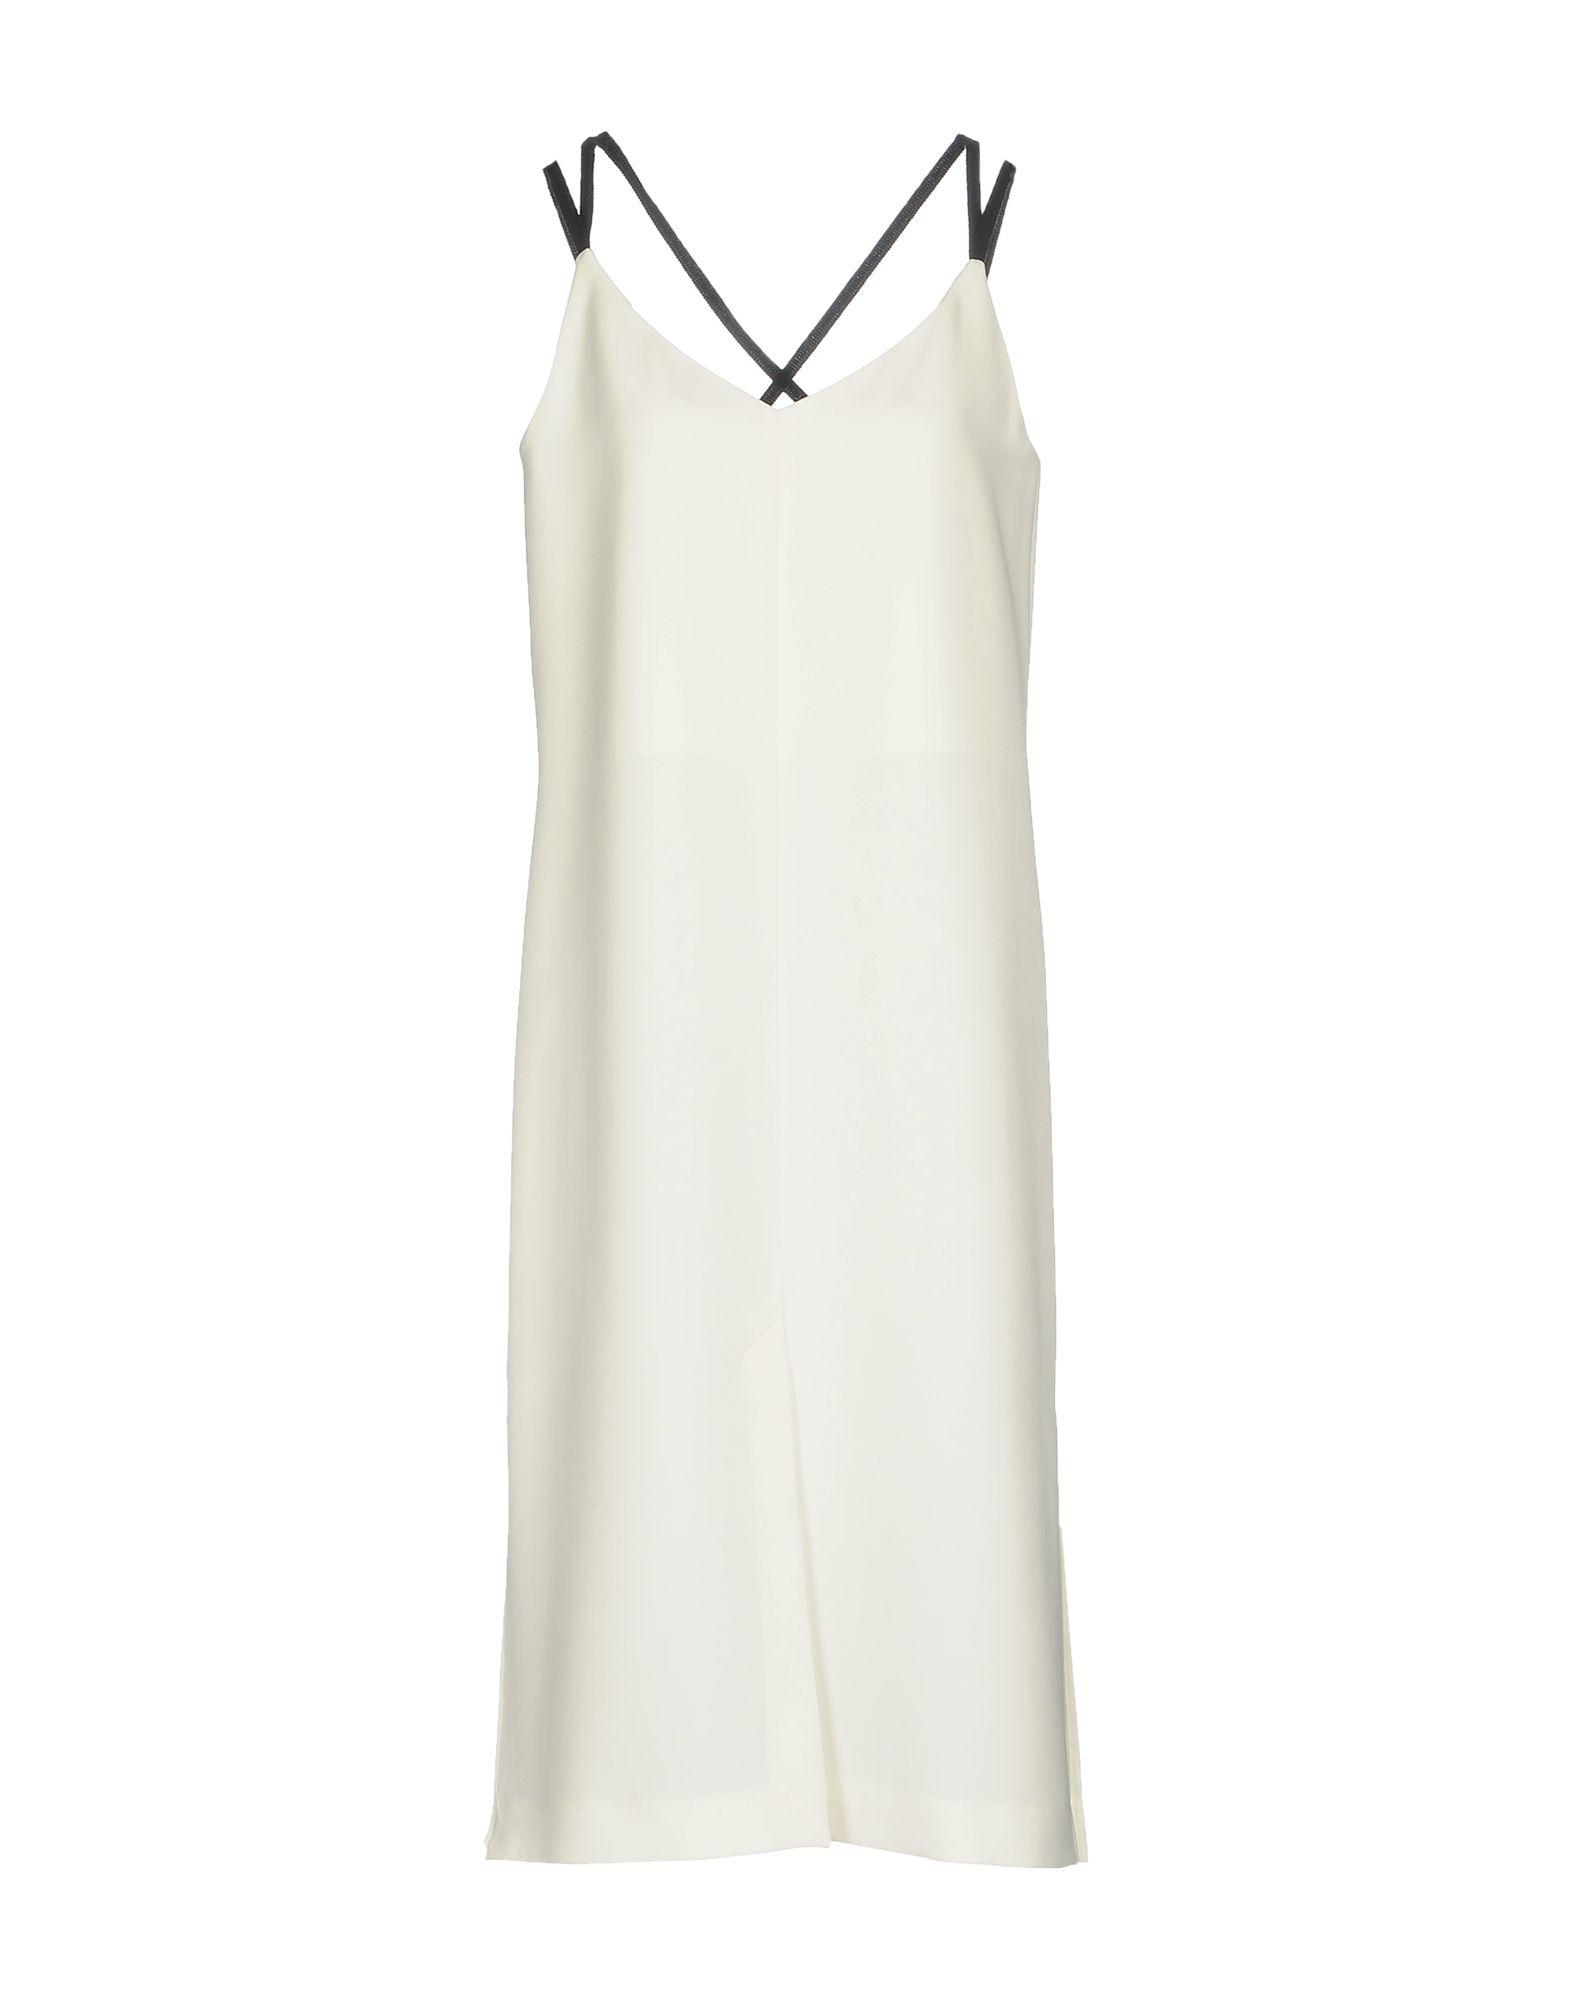 TARA JARMON Платье длиной 3/4 4kg refill laser copier color toner powder kits for xerox 113r00692 113r00689 113r00690 phaser 6120 6115mfp 6115 6120mfp printer